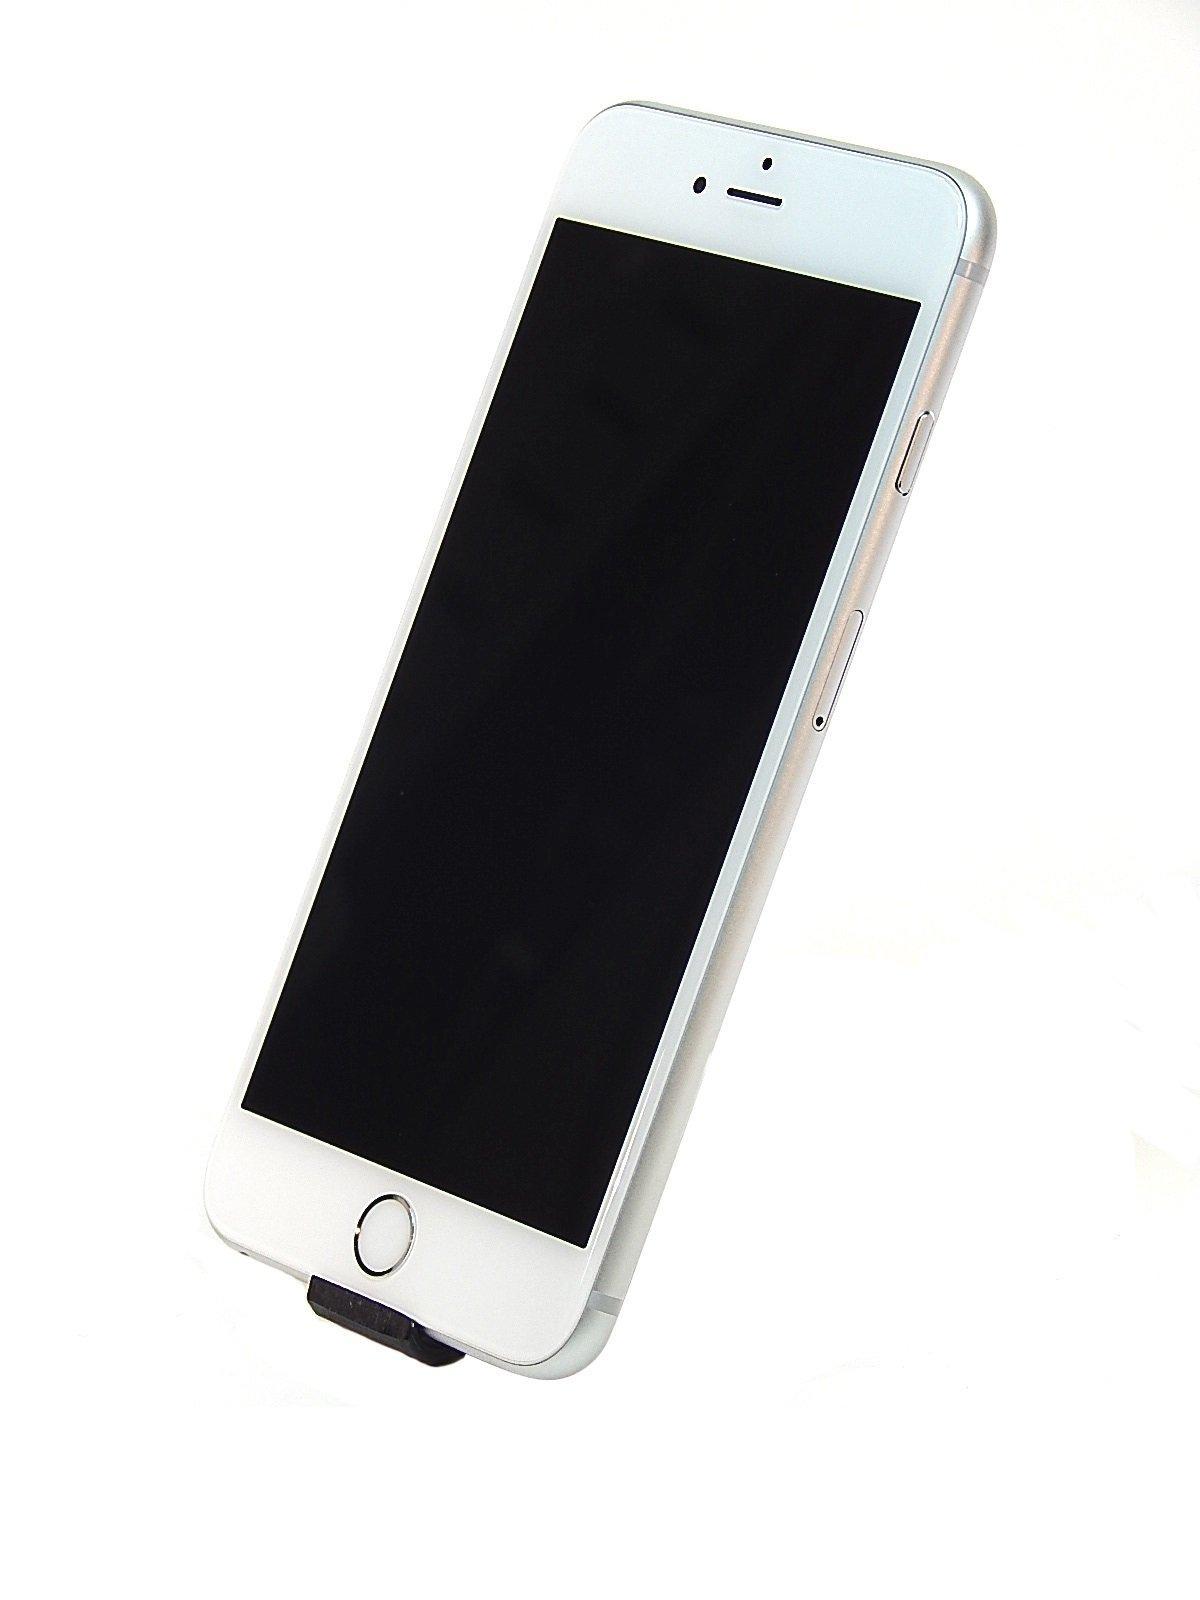 Browse Cell Phones Gamestop